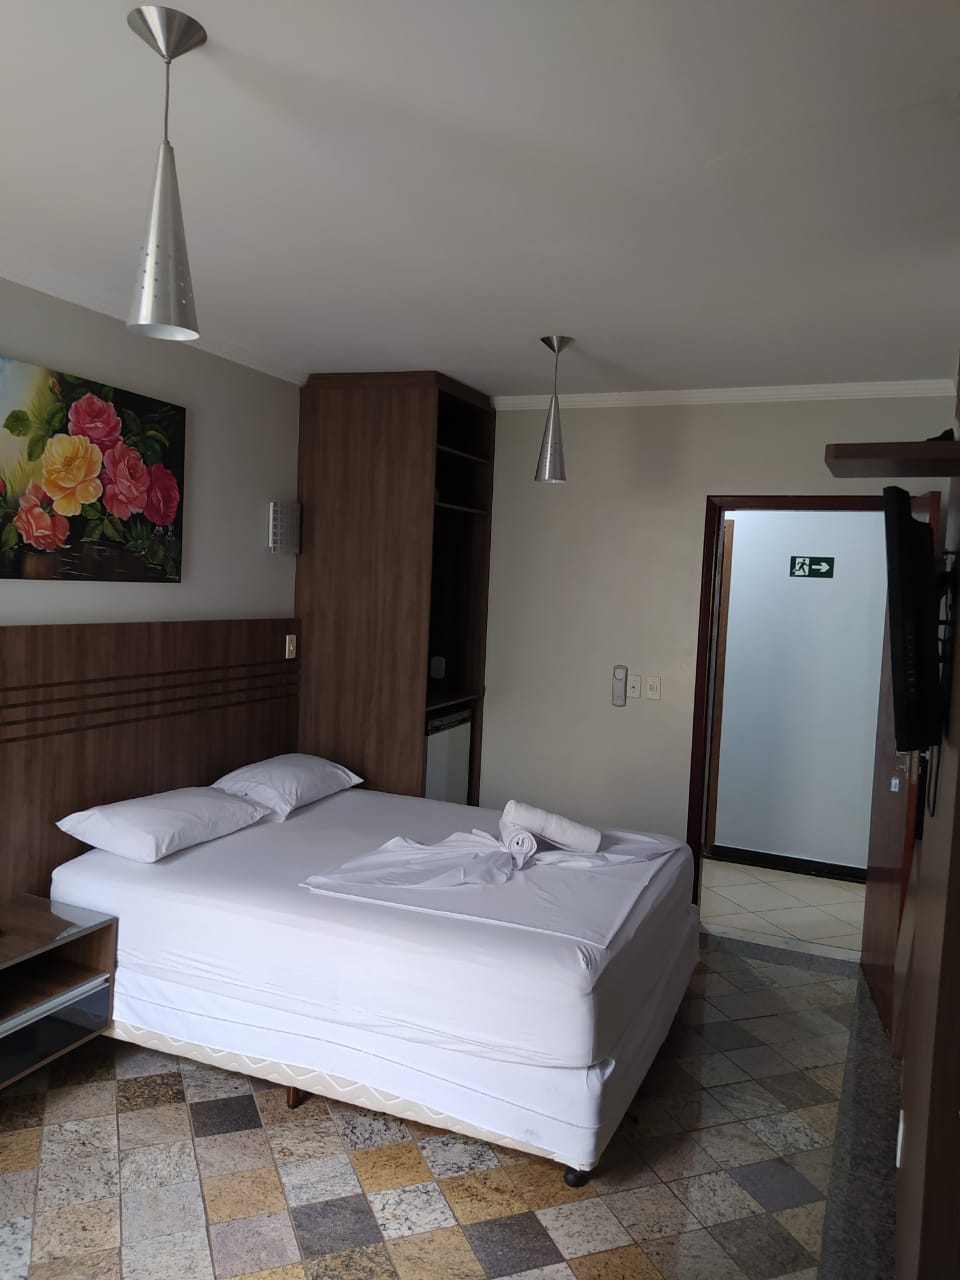 HOTEL-3 ALUGA SE FLATS MOBILLIADOS